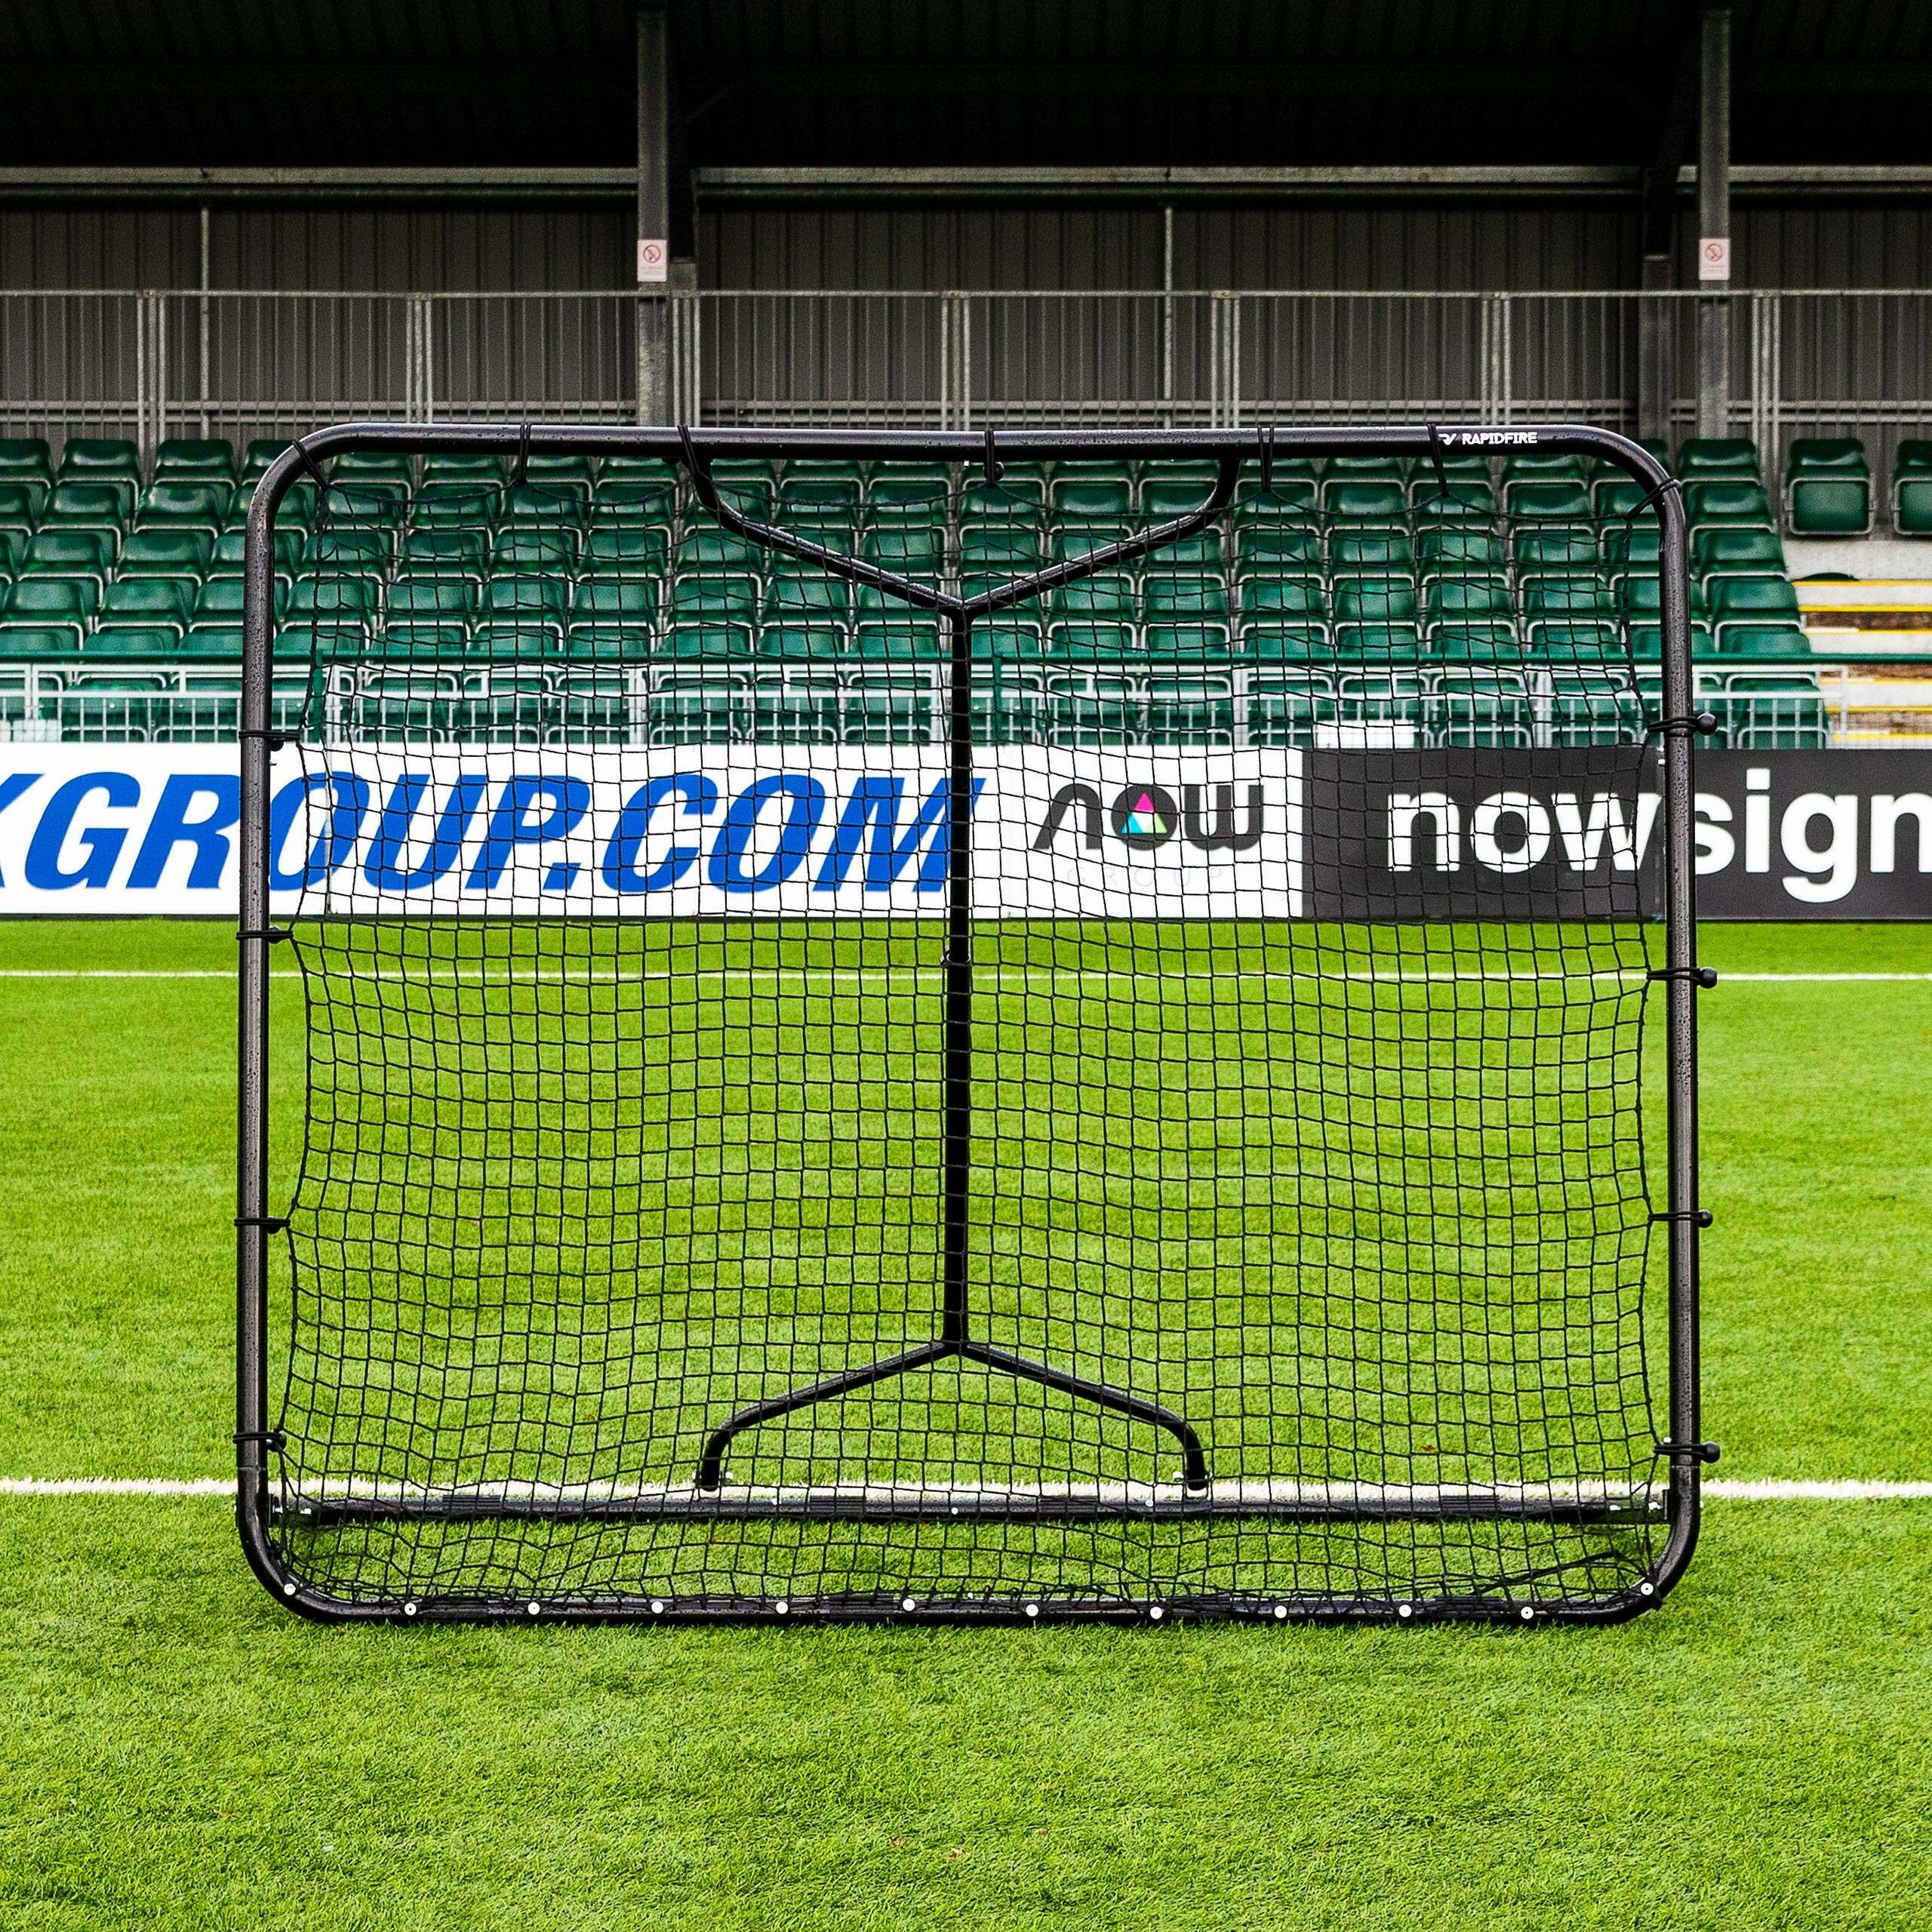 RapidFire Mega GAA Gaelic Football And Hurling Rebounder - Small (5ft x 6ft)